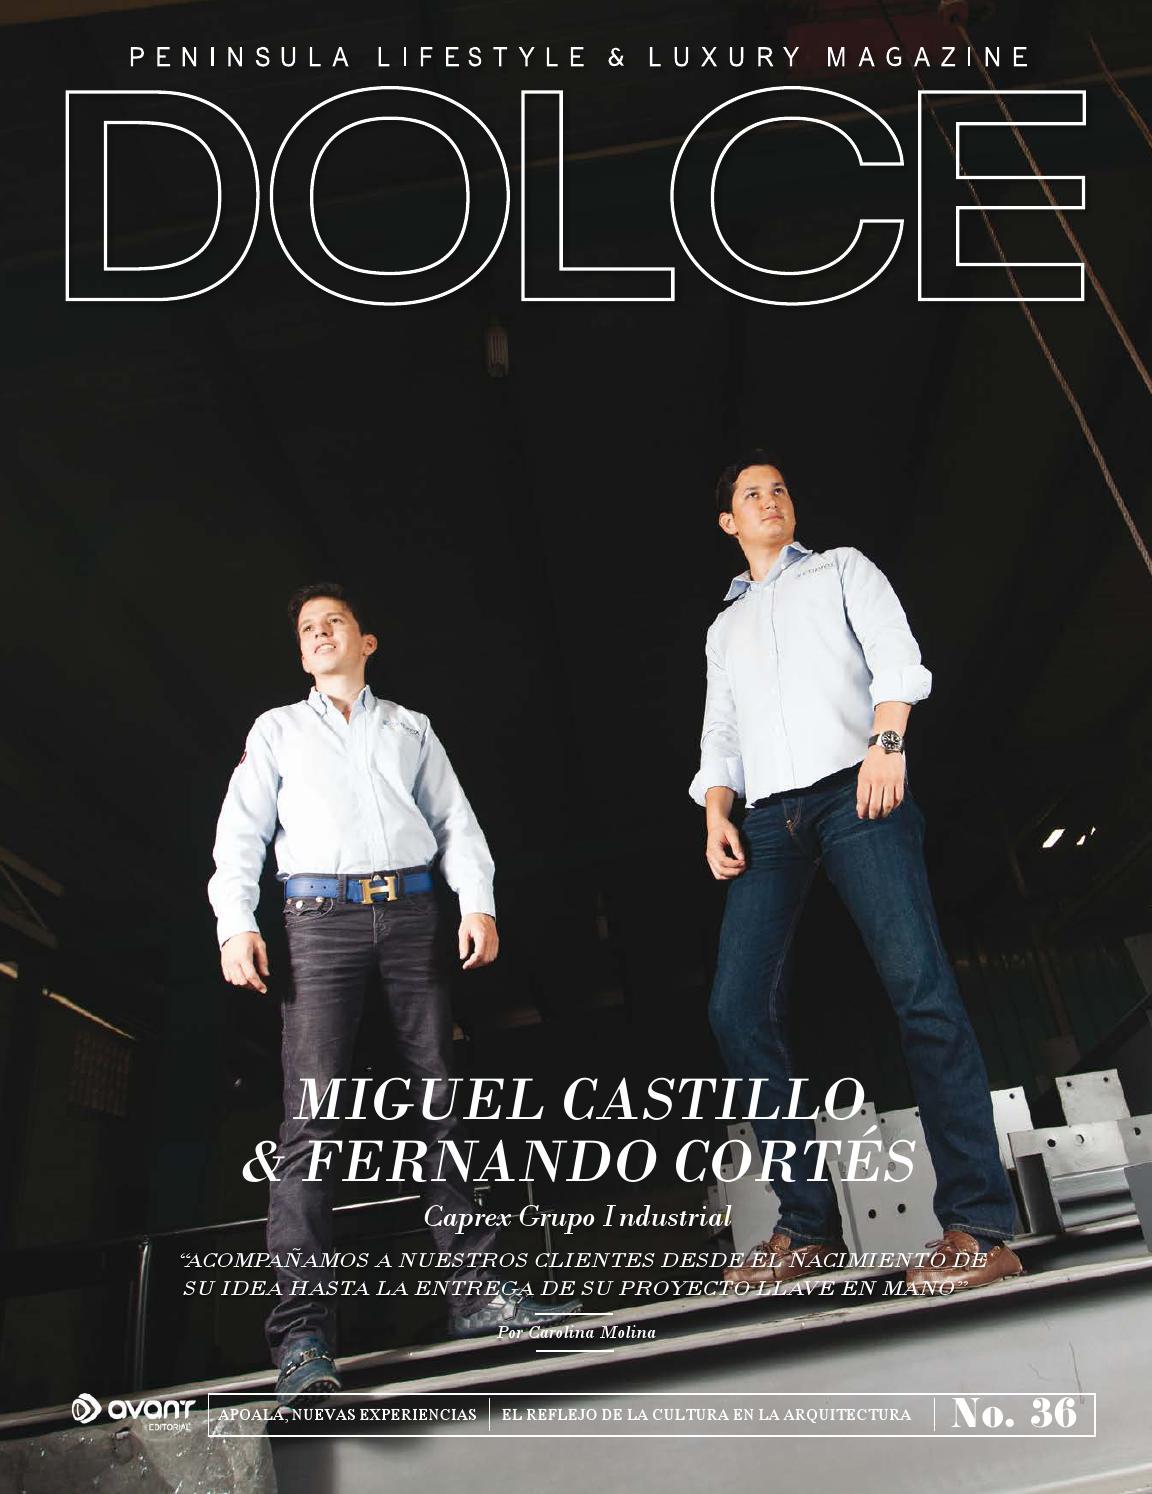 DOLCE magazine No.36 / 2014 by Dolce magazine - issuu